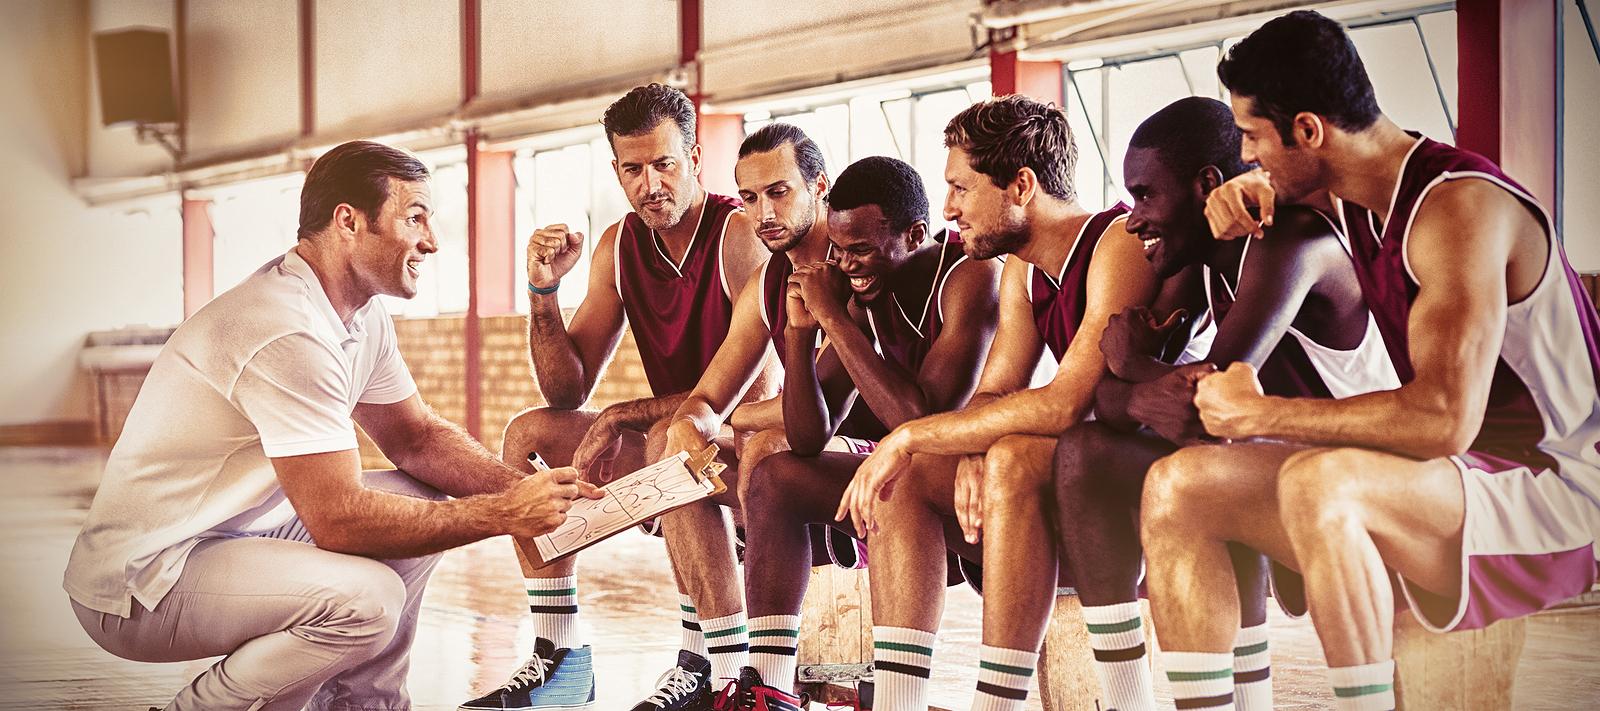 Coaching The Un-coachable